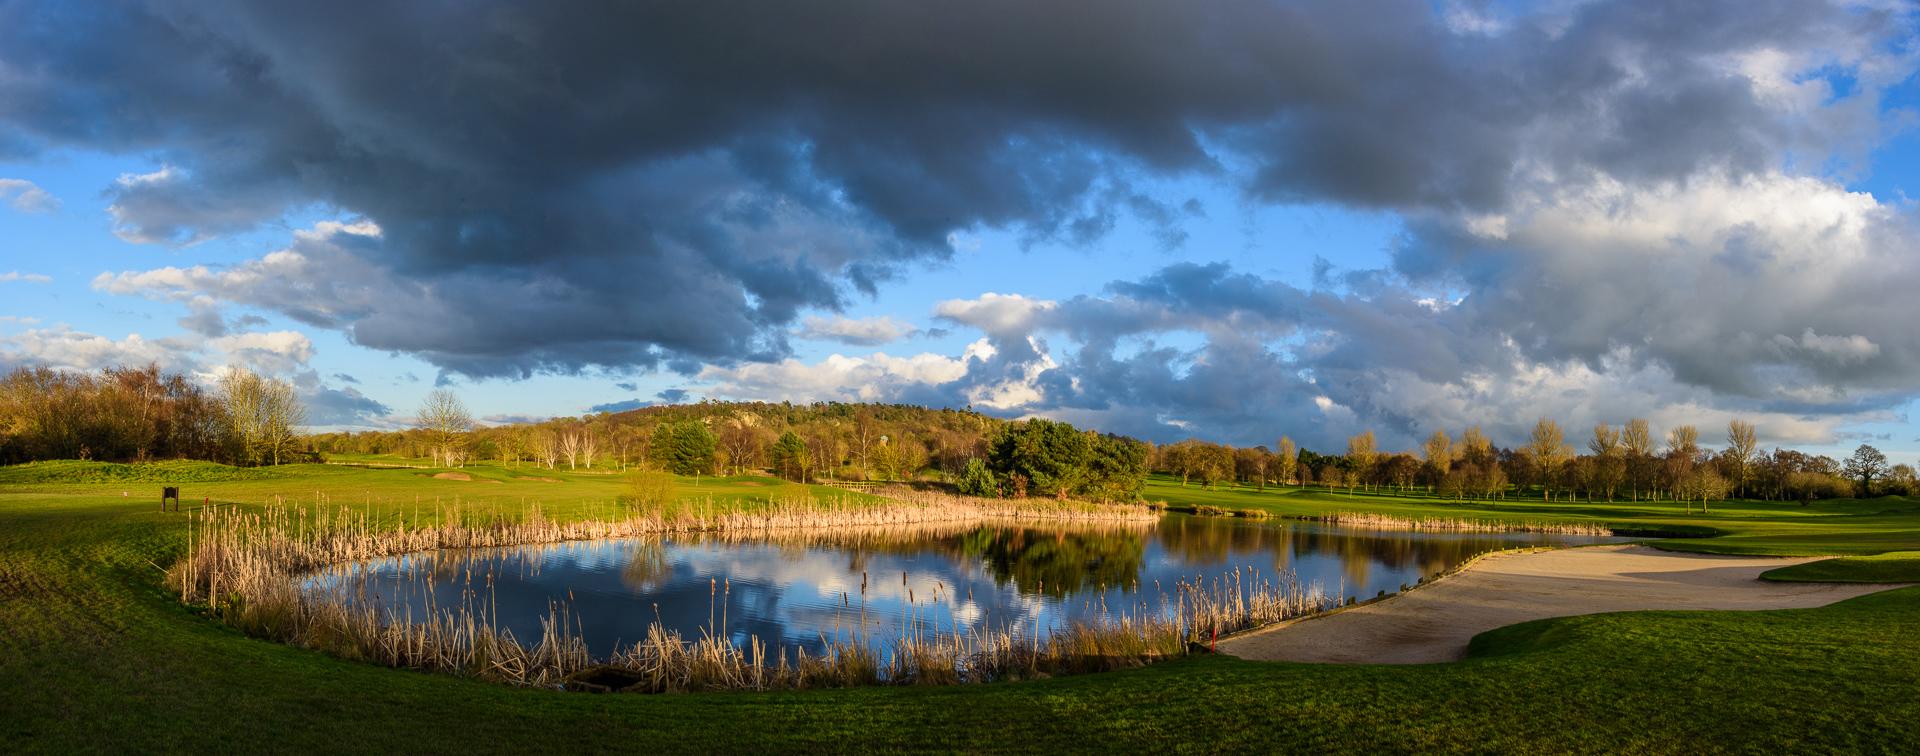 Kevindiss.com golf course photography Hawkstone Park golf course-.jpg